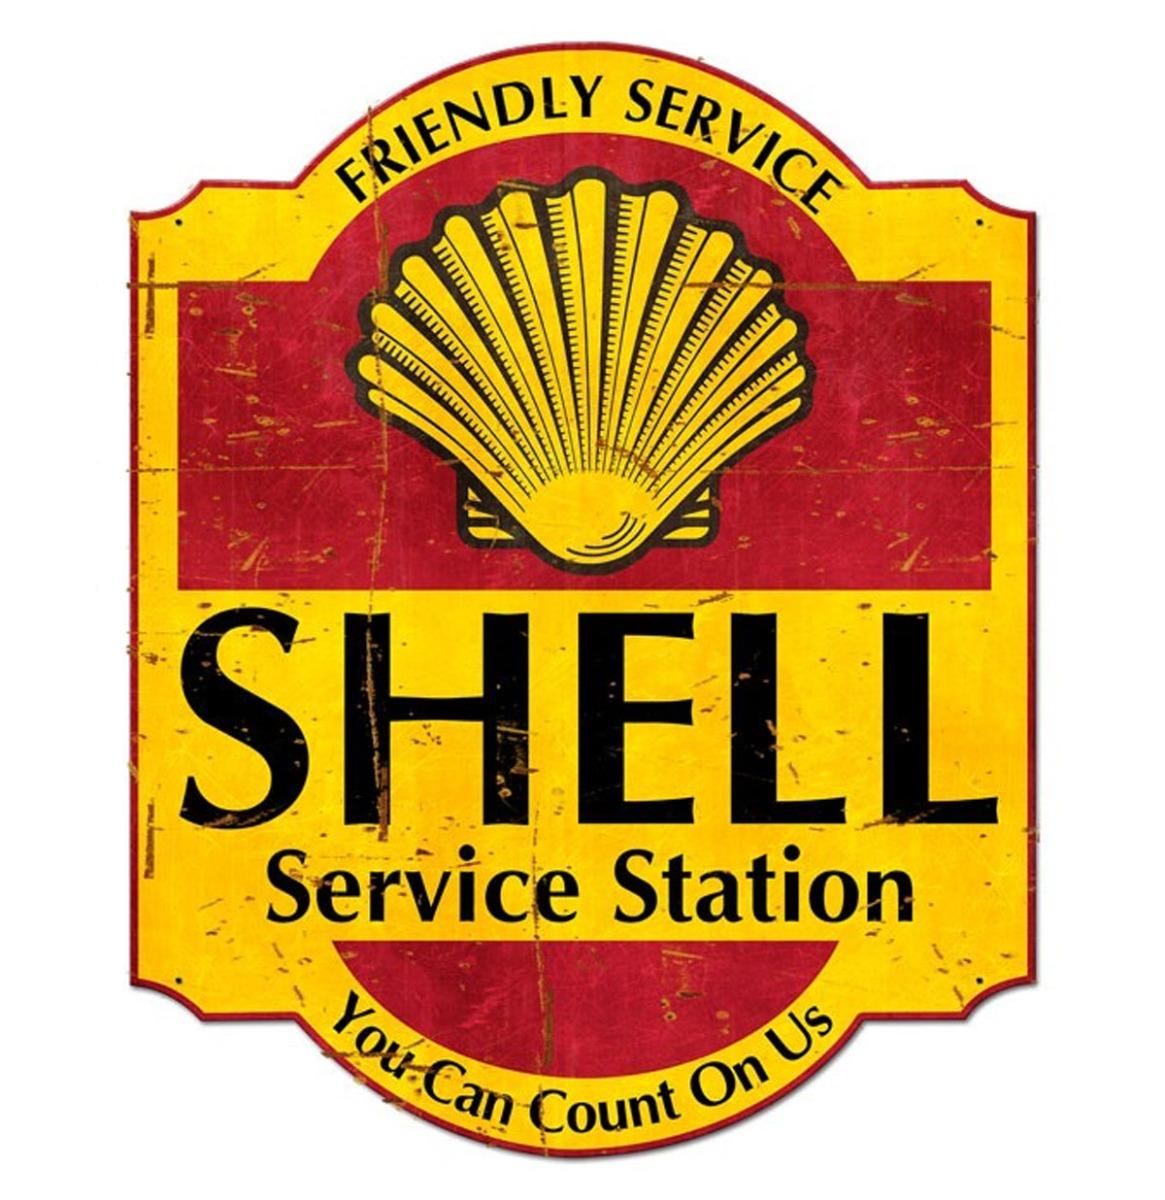 Friendly Service Shell Service Station Grunge Zwaar Metalen Bord 62 x 76 cm